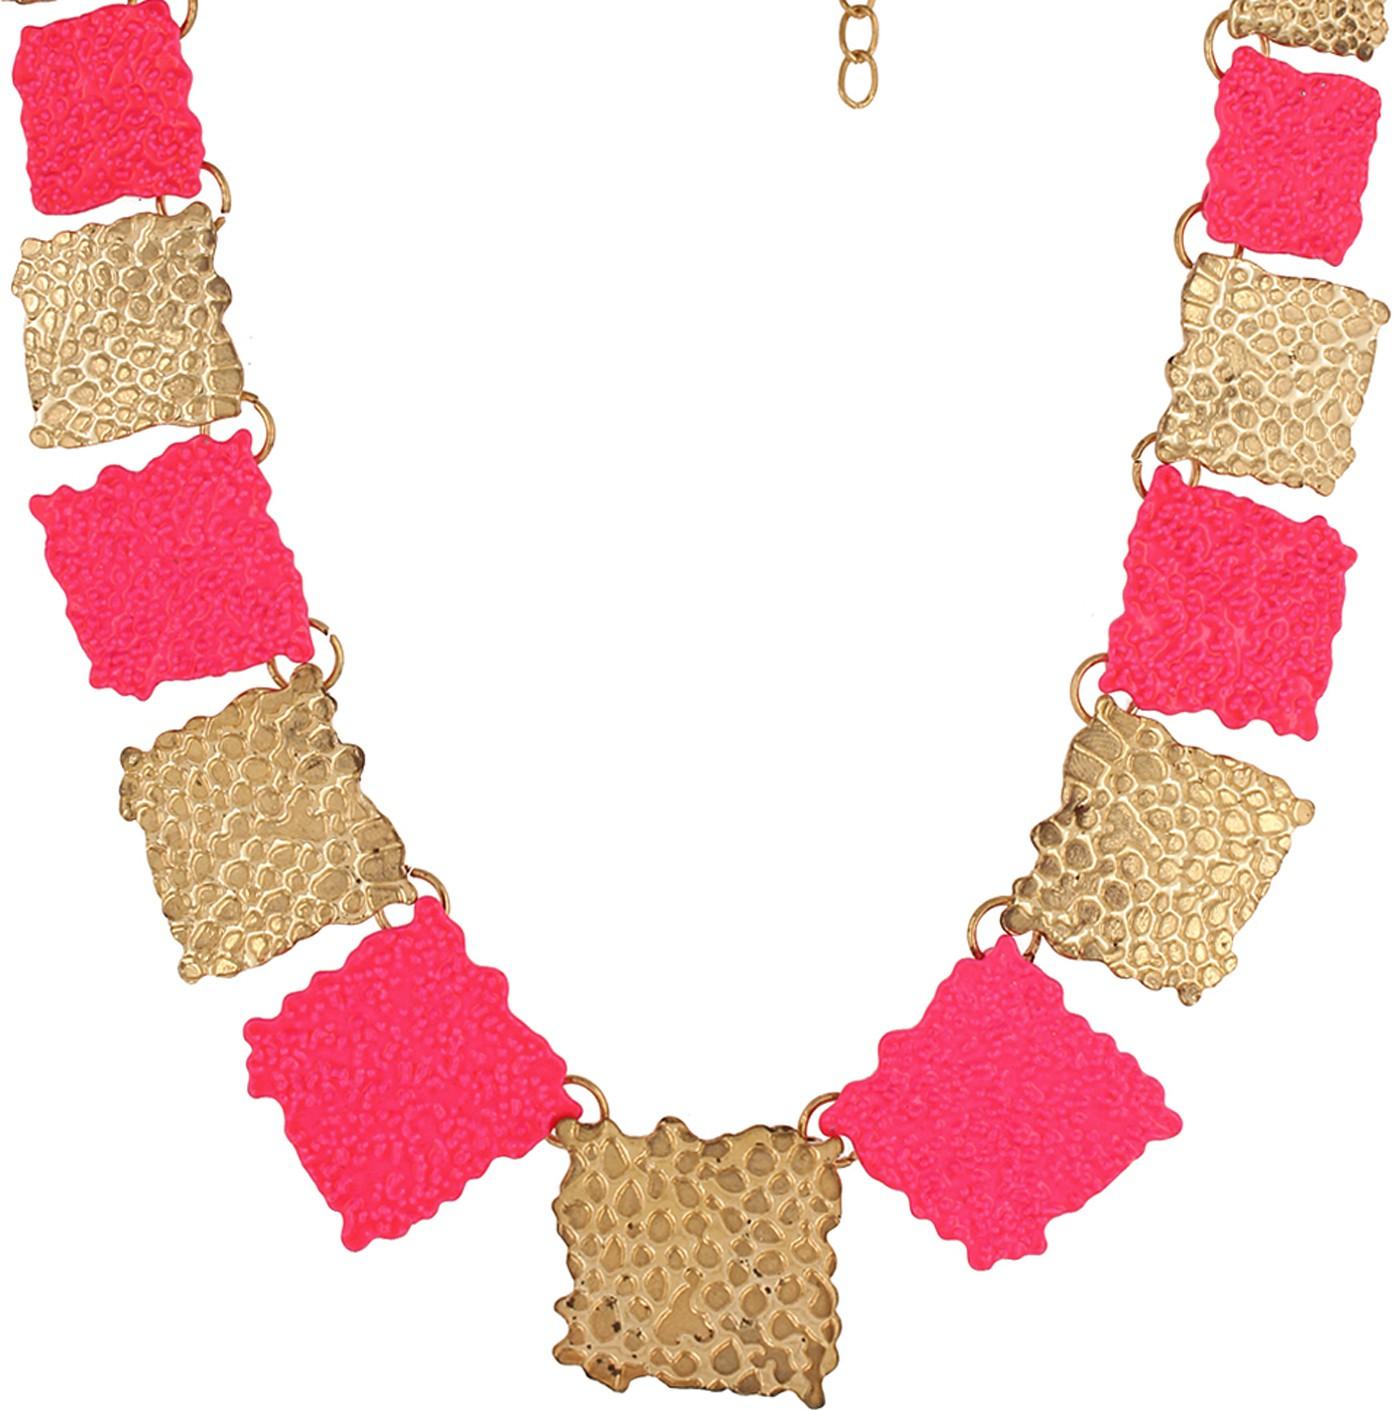 Deals - Delhi - Minimum 50% Off <br> Earrings, Pendants, Rings...<br> Category - jewellery<br> Business - Flipkart.com